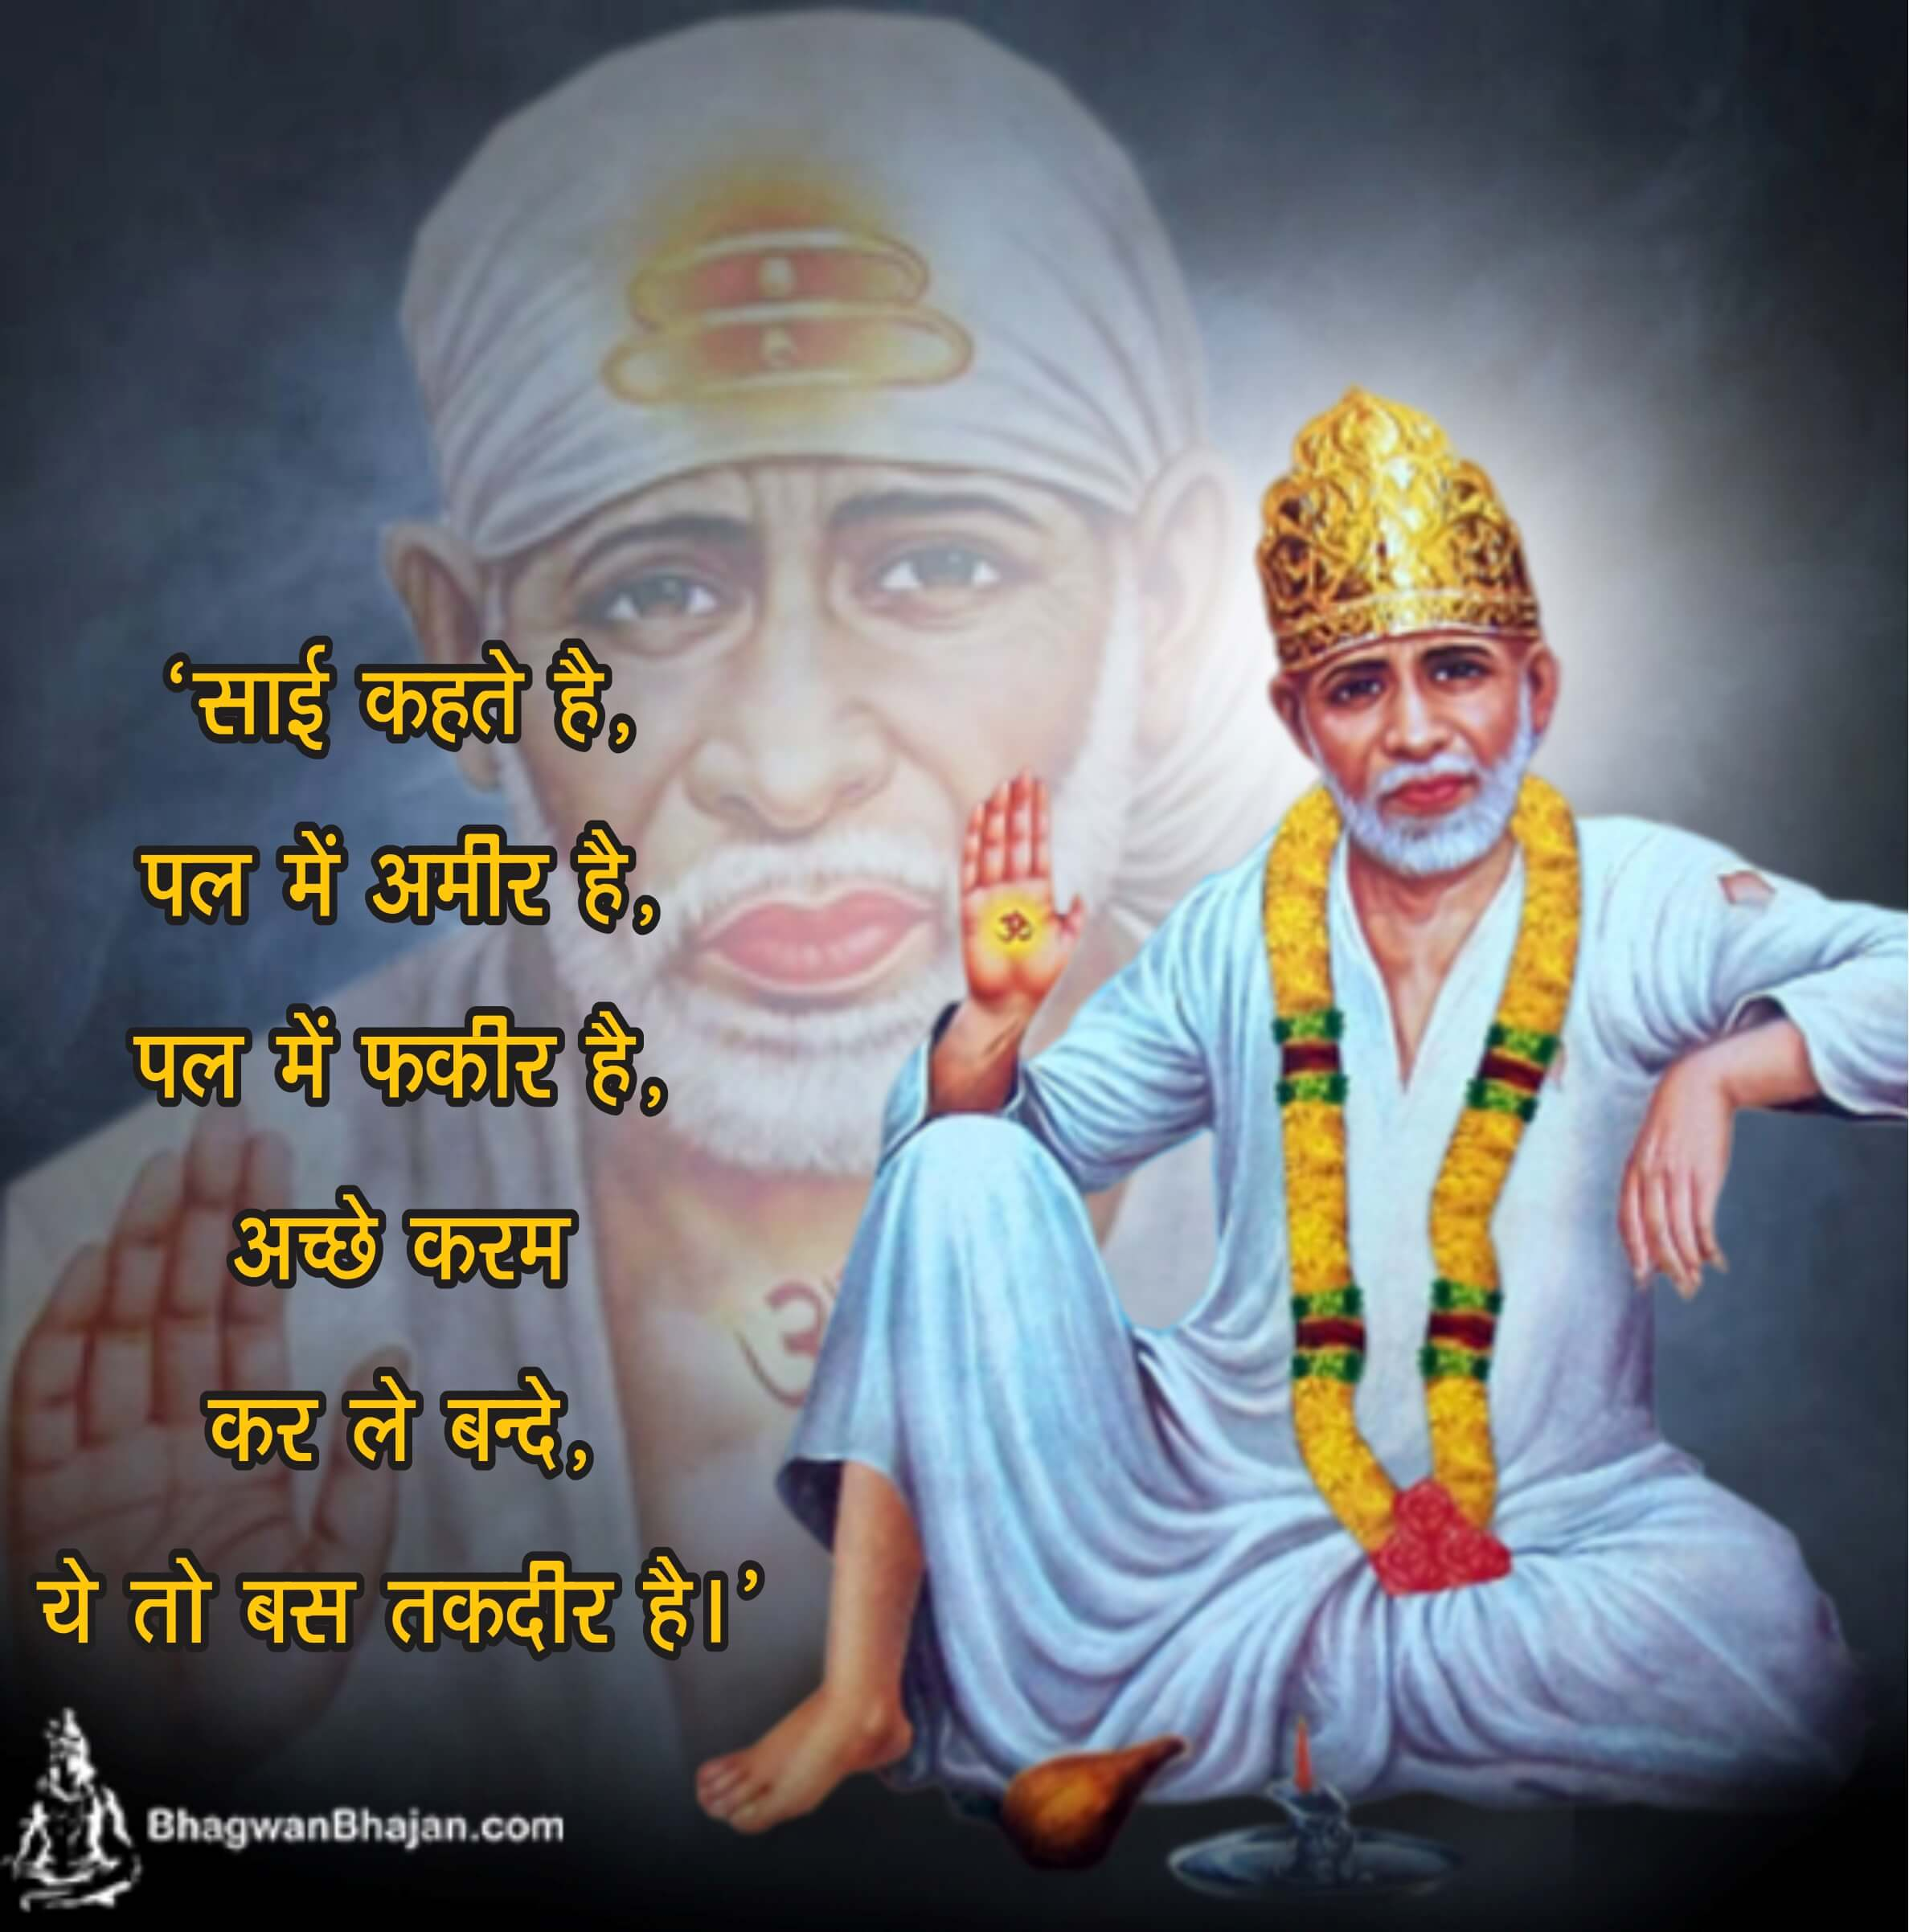 Sai Baba Whatsapp Status Pictures